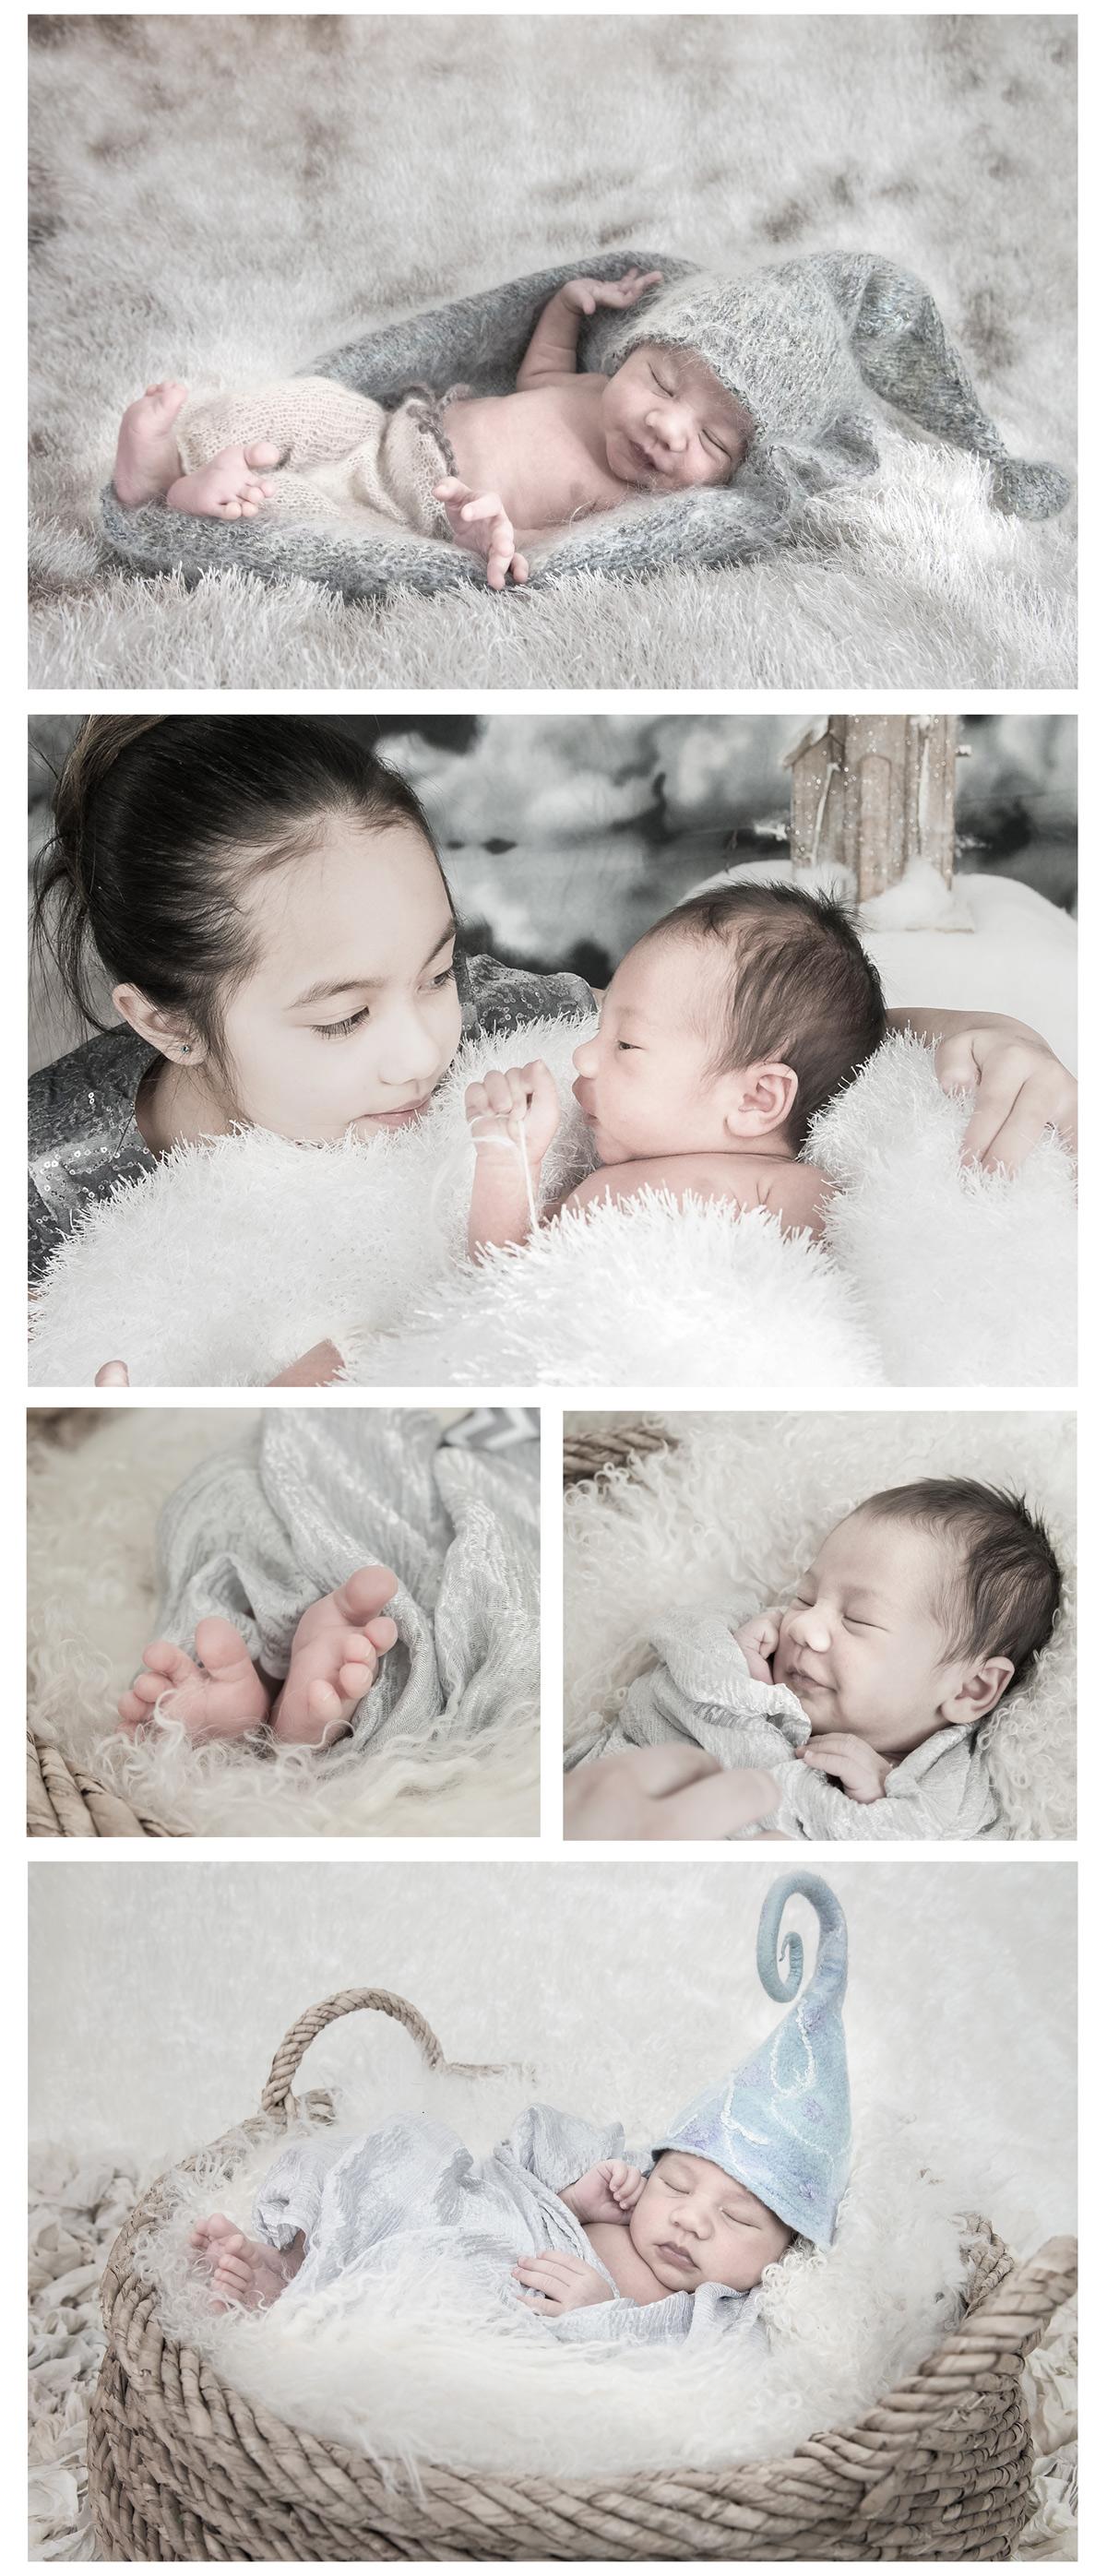 newborn-baby-sisterlove-free-lense-photo.jpg